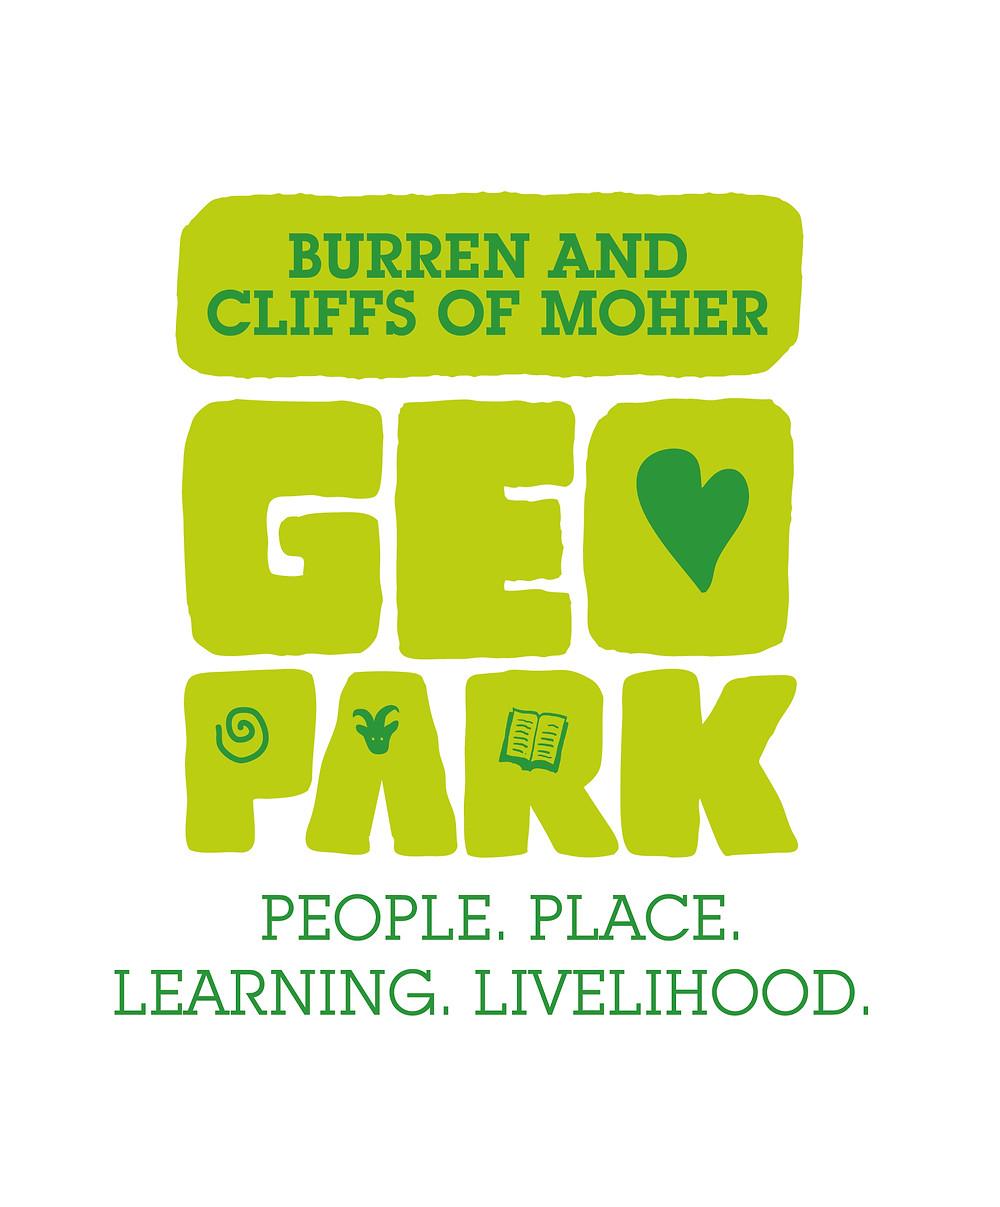 Burren & Cliffs of Moher Geopark awarded UNESCO status